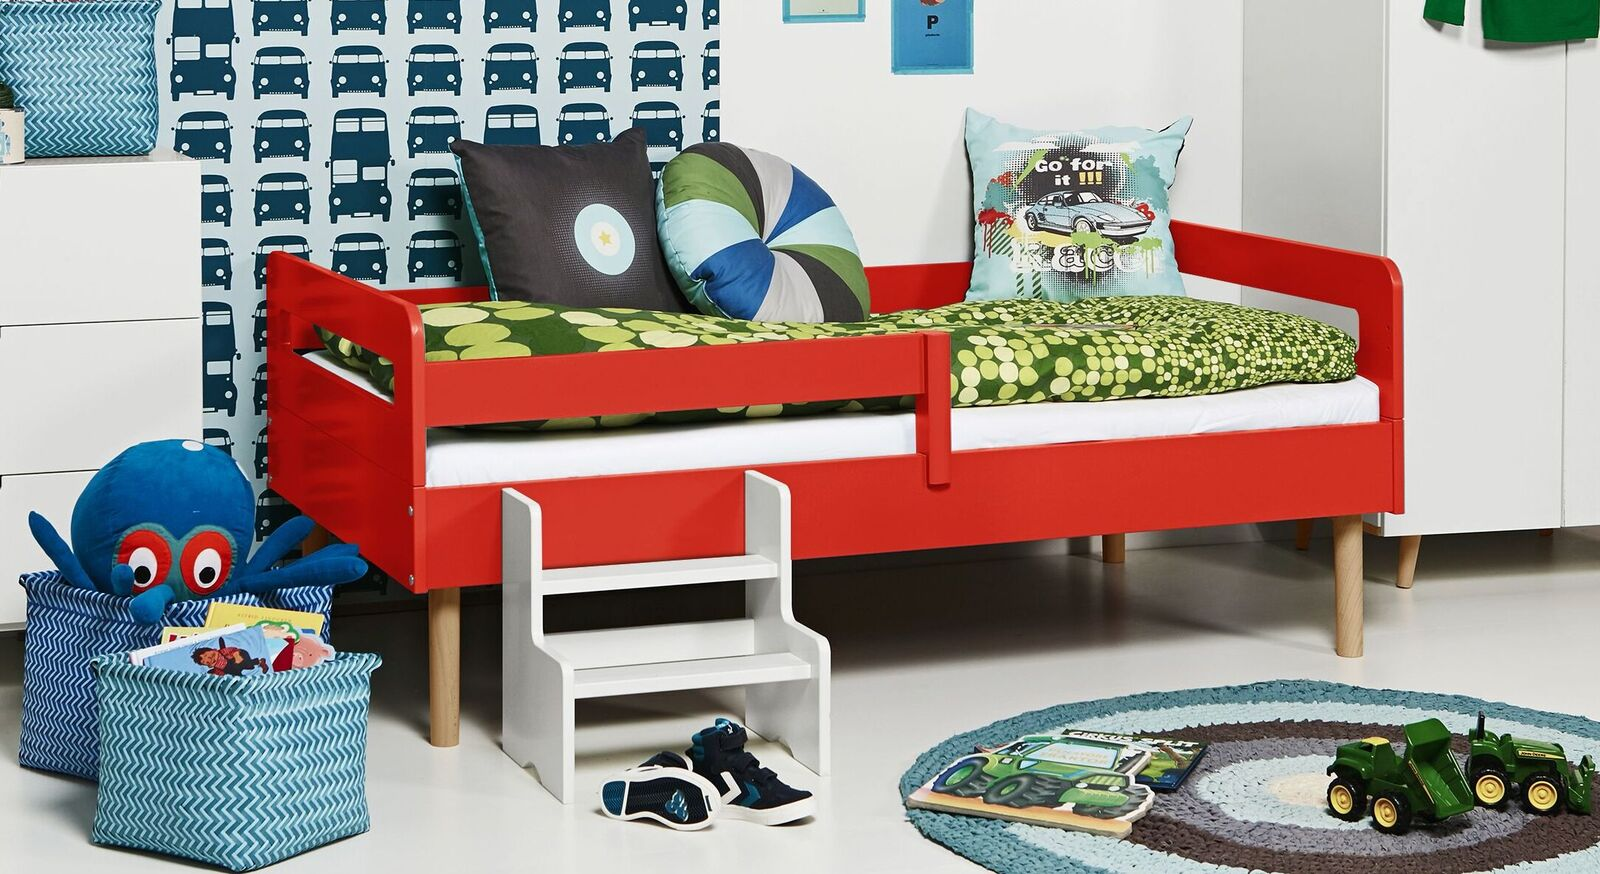 Modernes Kinderbett Kids Town Retro aus rotem MDF